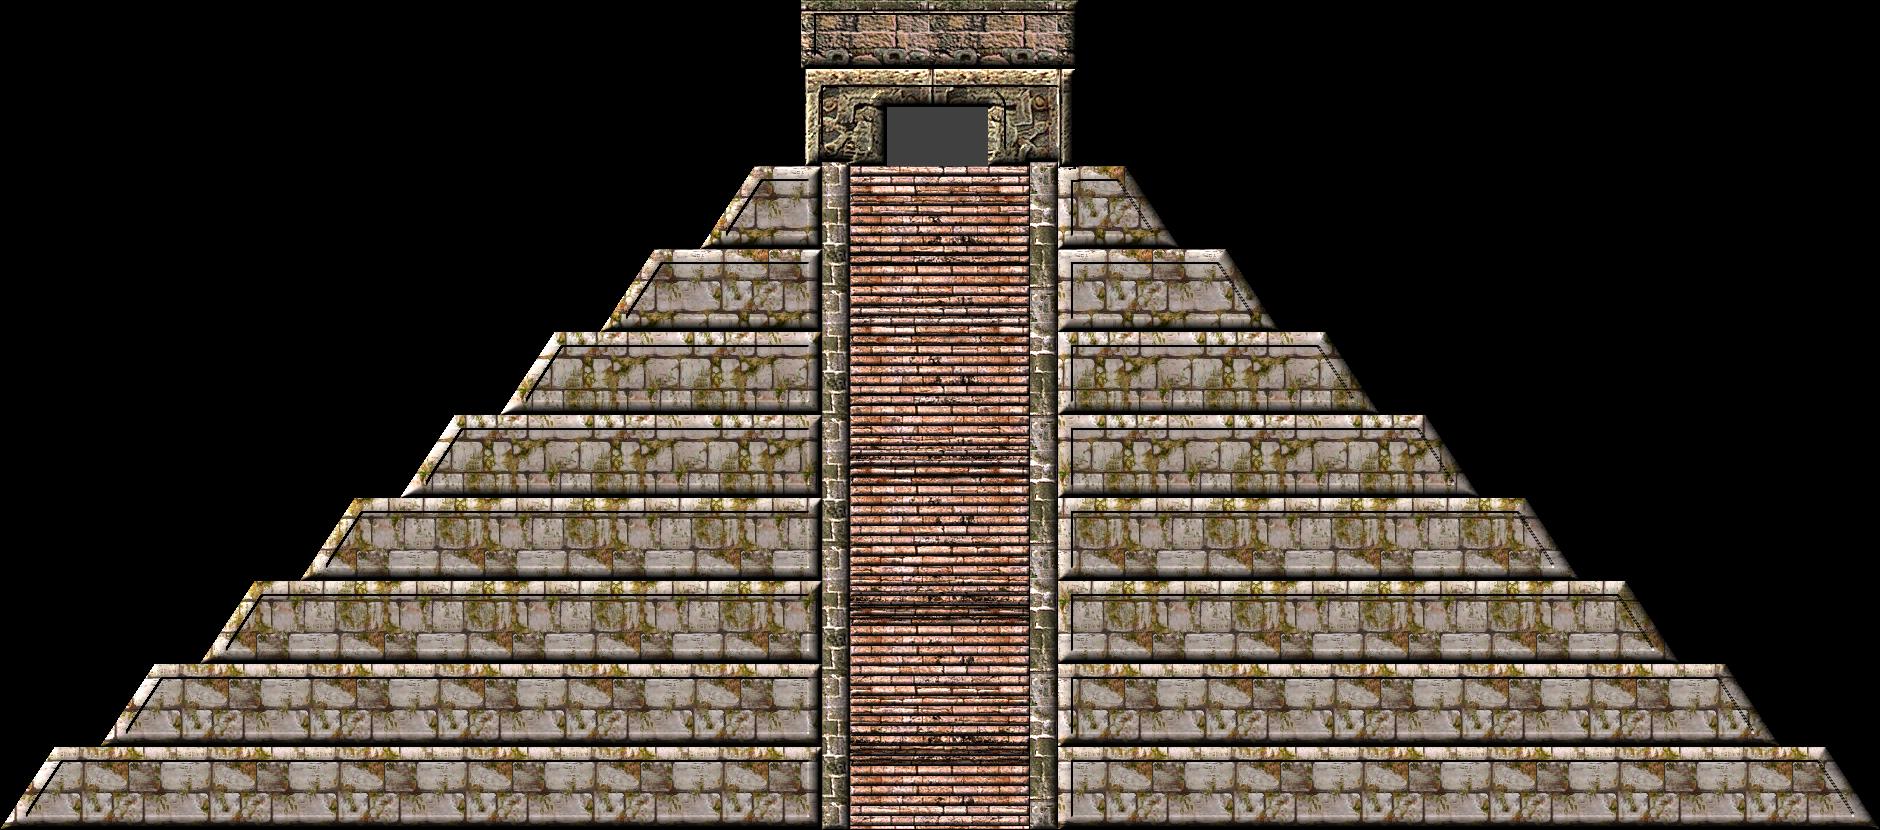 Drawn pyramid aztec pyramid Aztec by Aztec on Pyramid